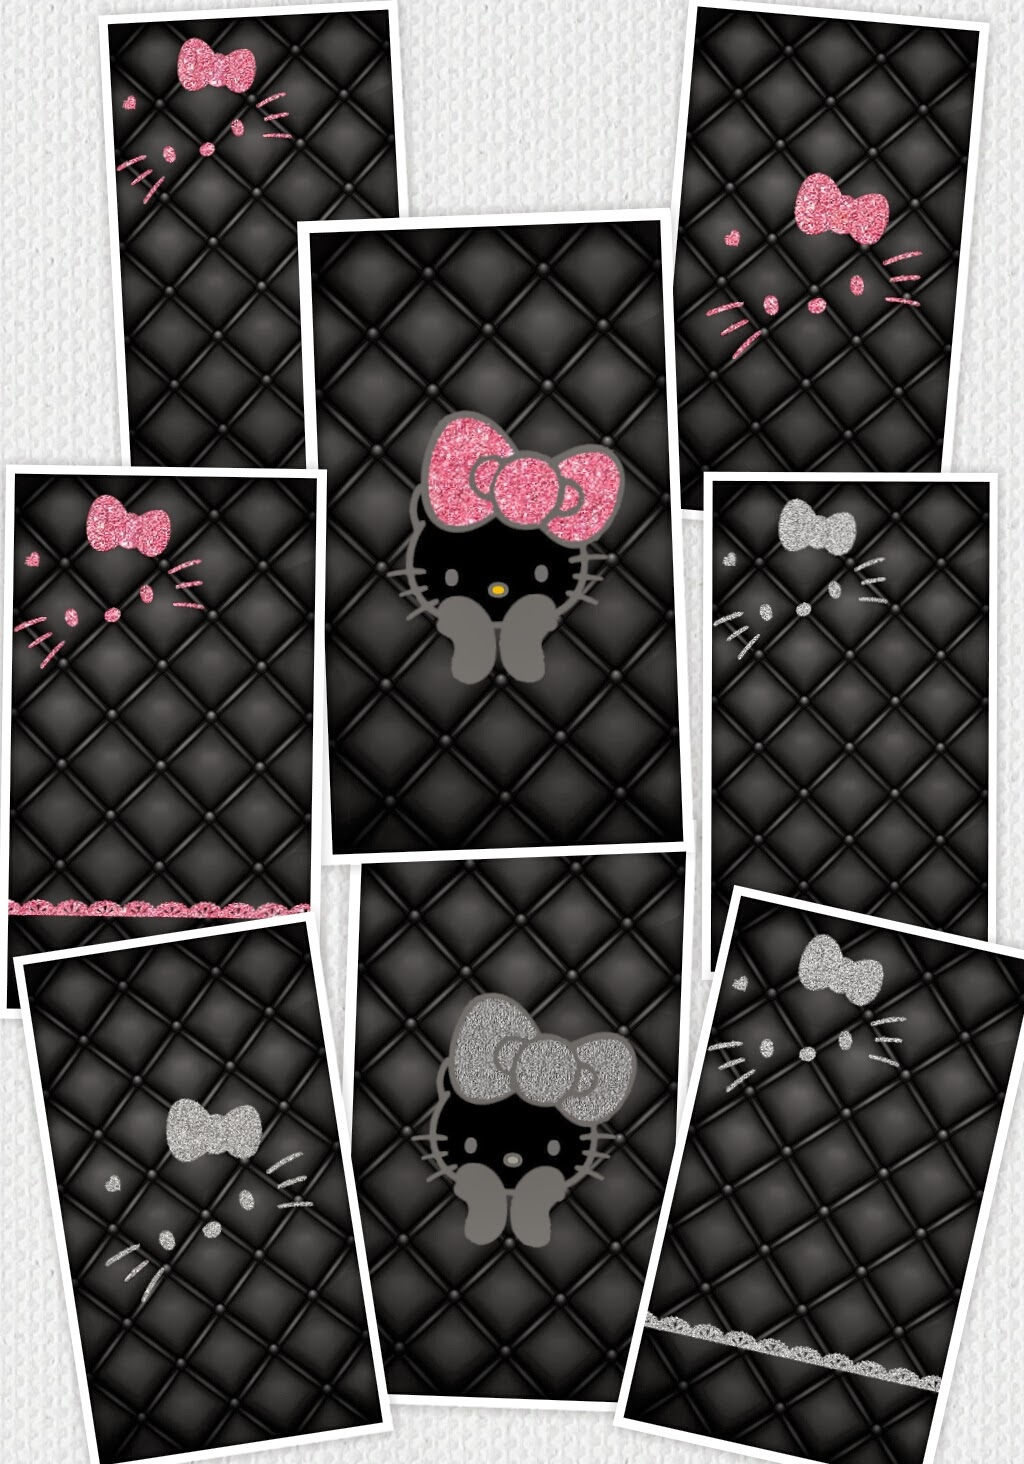 Amazing Wallpaper Hello Kitty Glitter - PhotoGrid_1385072119135  Perfect Image Reference_854580.jpg